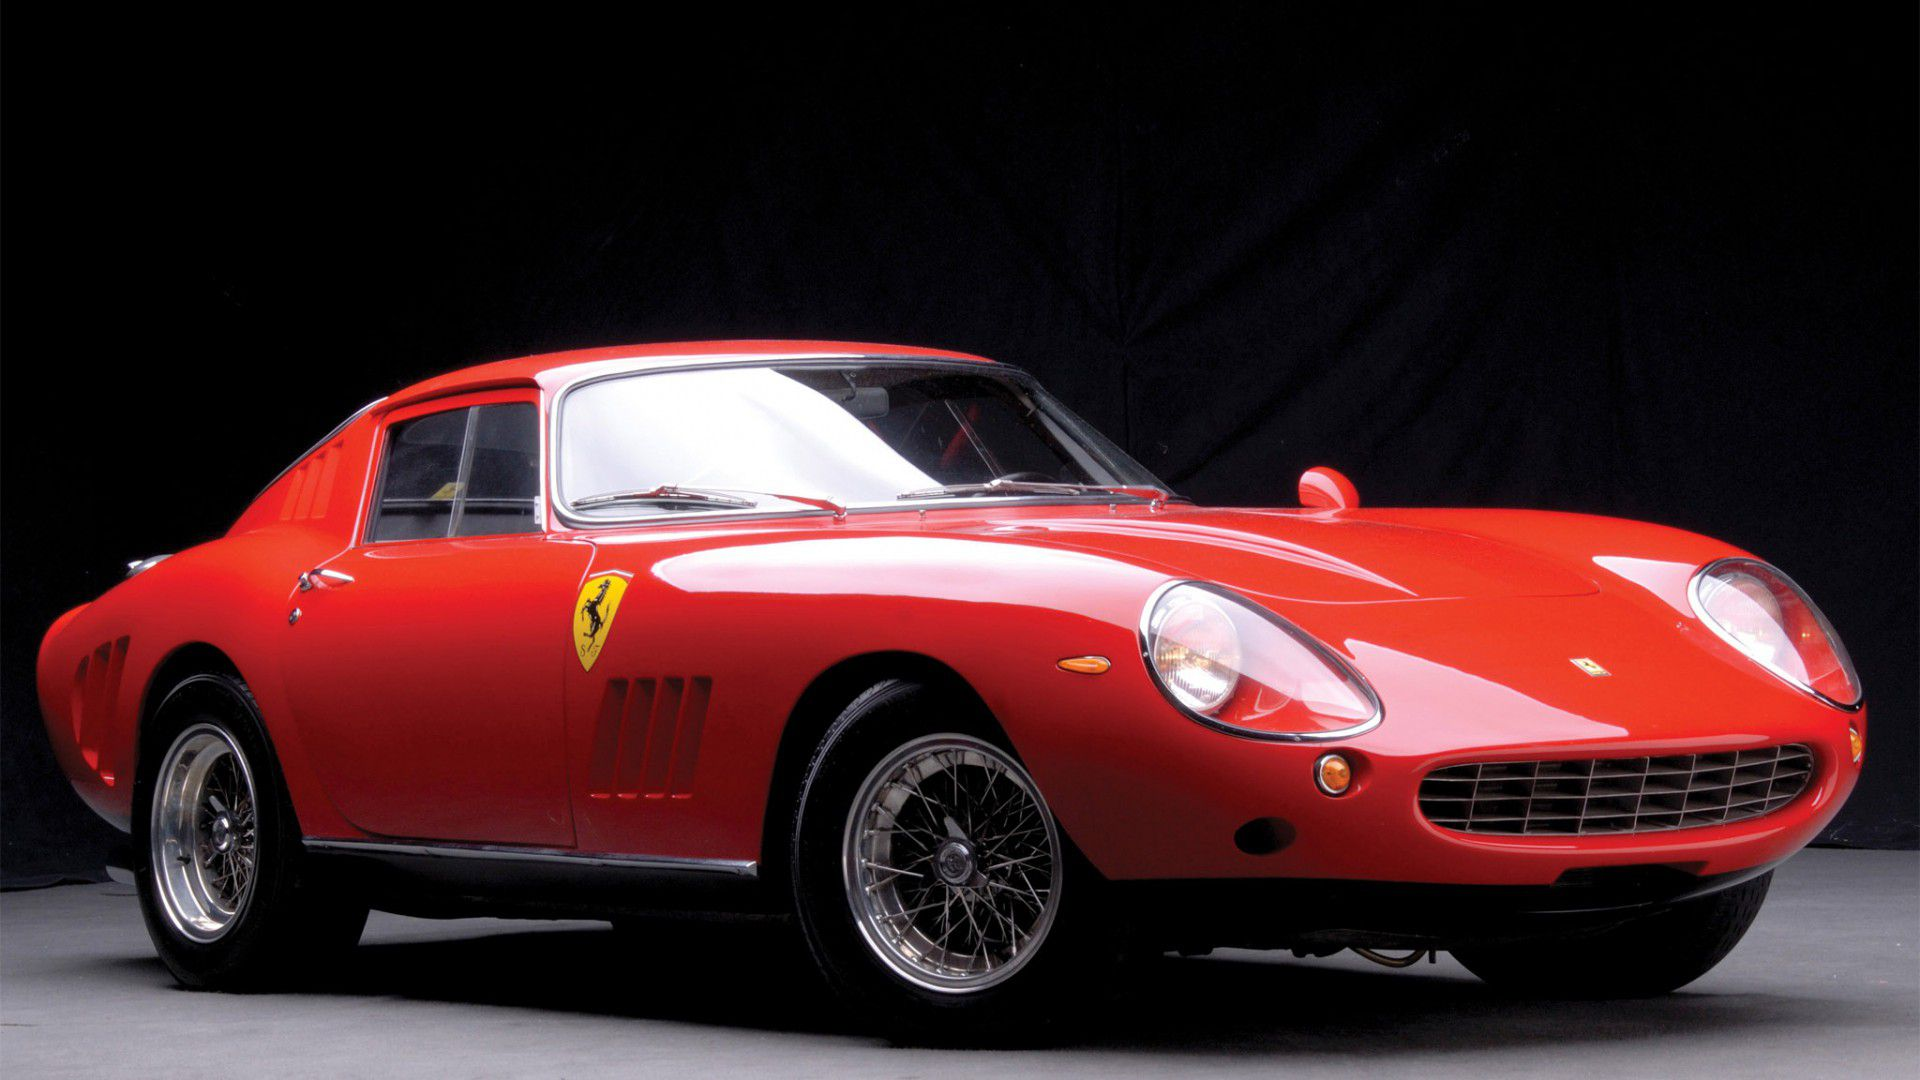 Ferrari 275 GTB Coupe